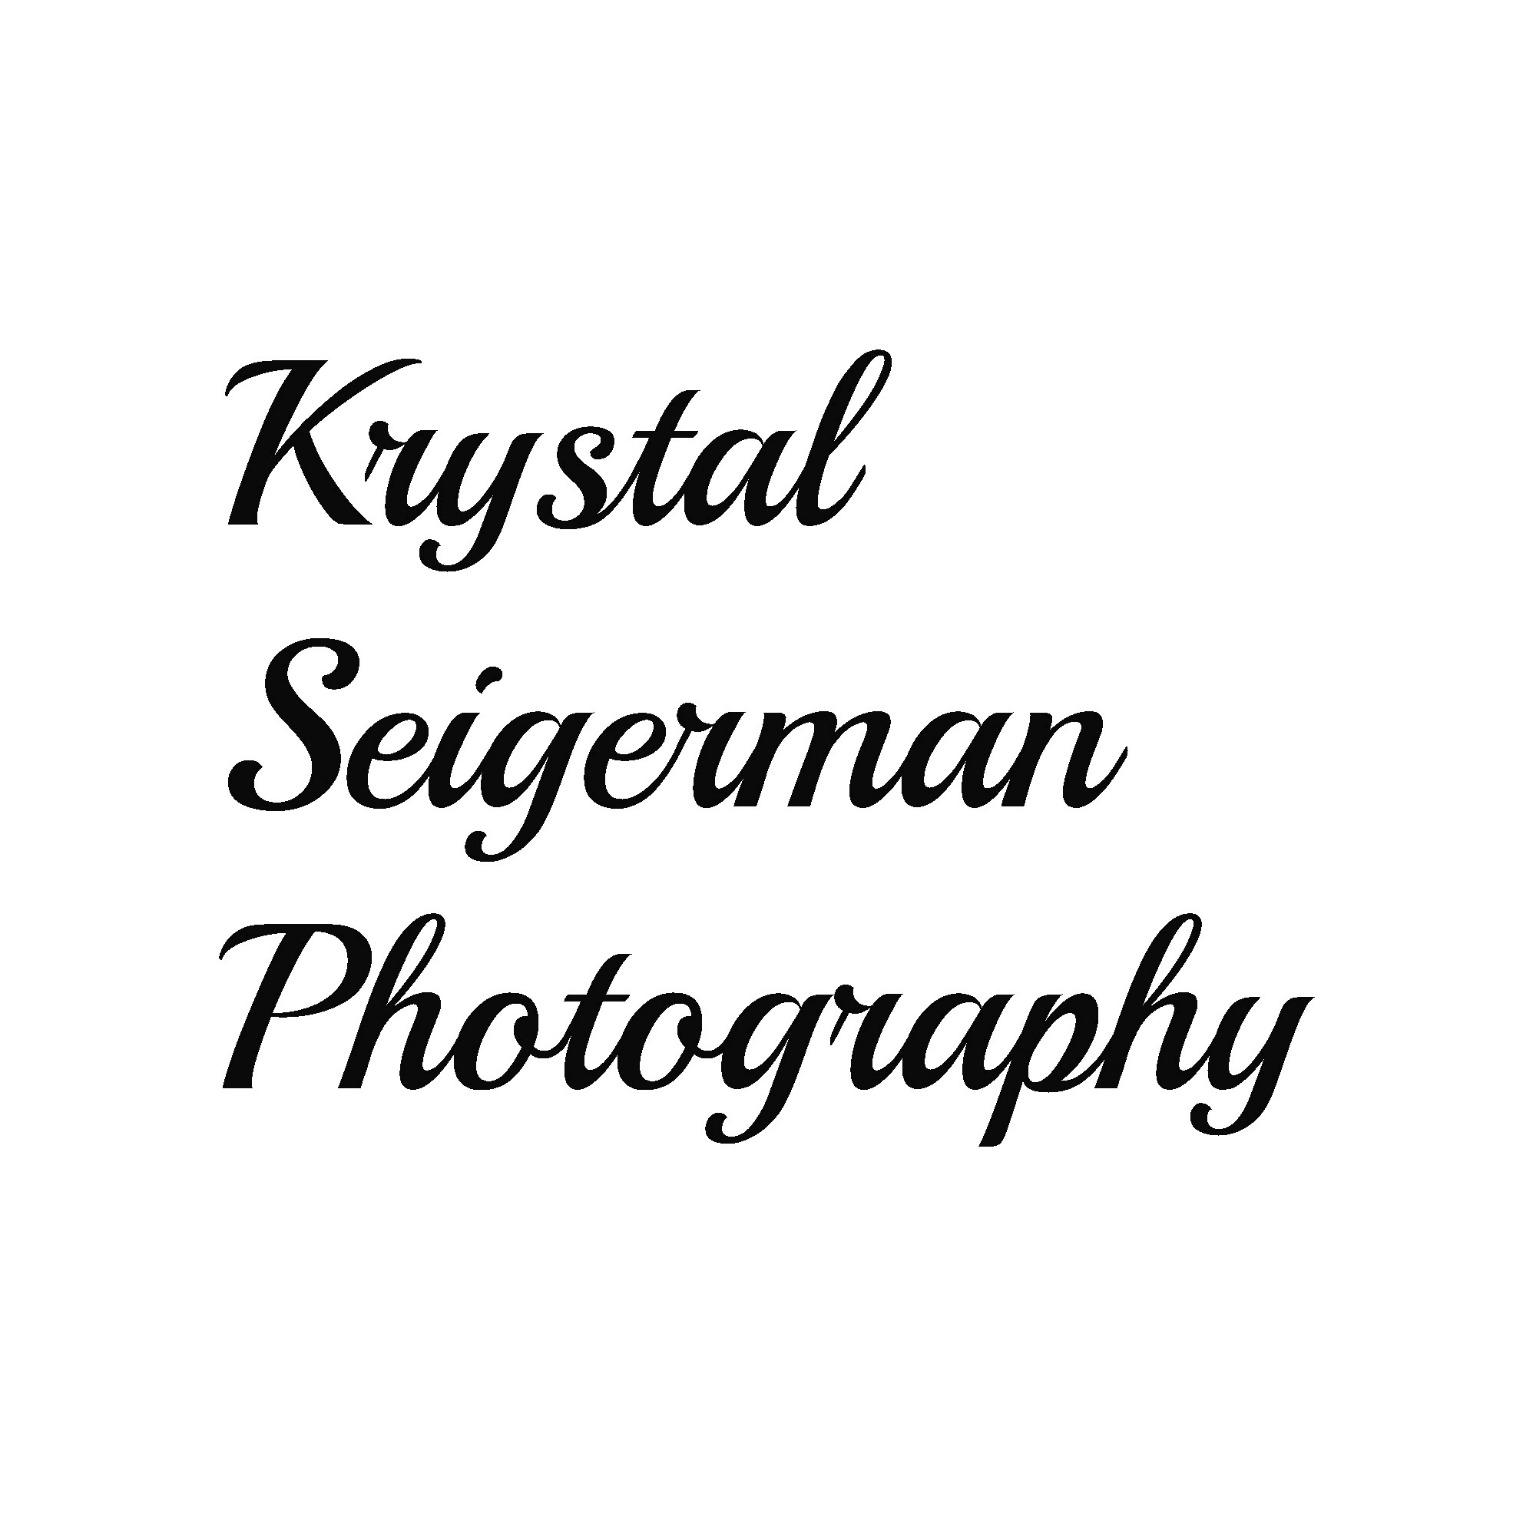 Krystal Seigerman Photography